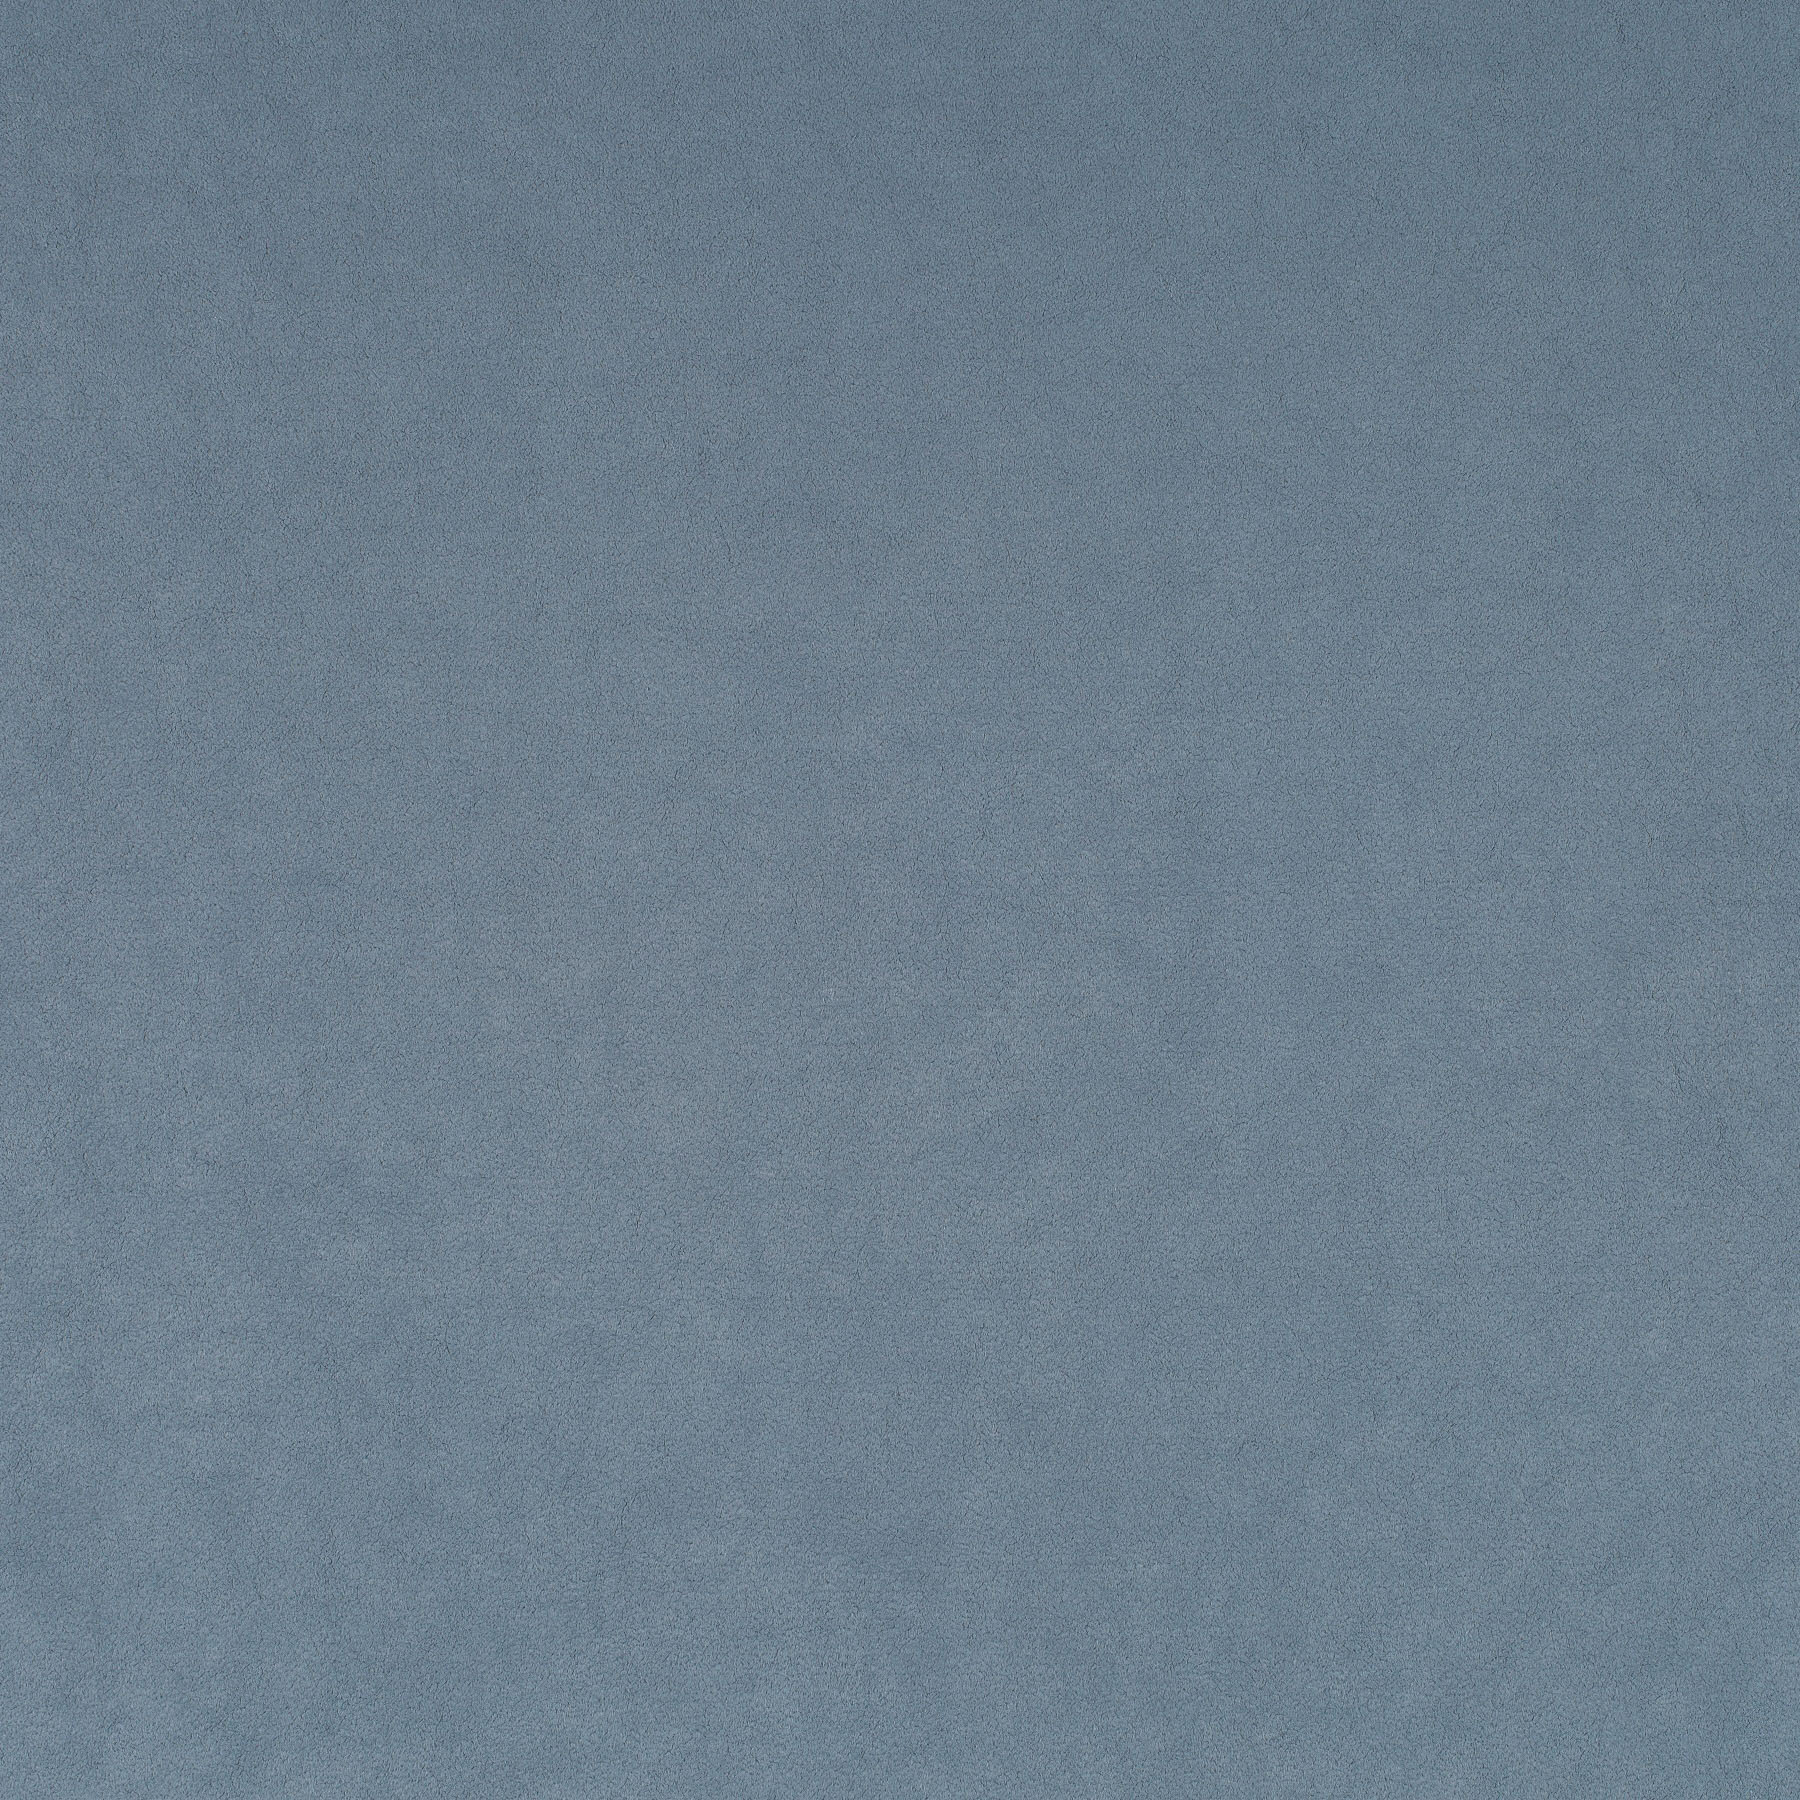 upholstery fabric jabana 1 3002 357 jab anstoetz fabrics. Black Bedroom Furniture Sets. Home Design Ideas